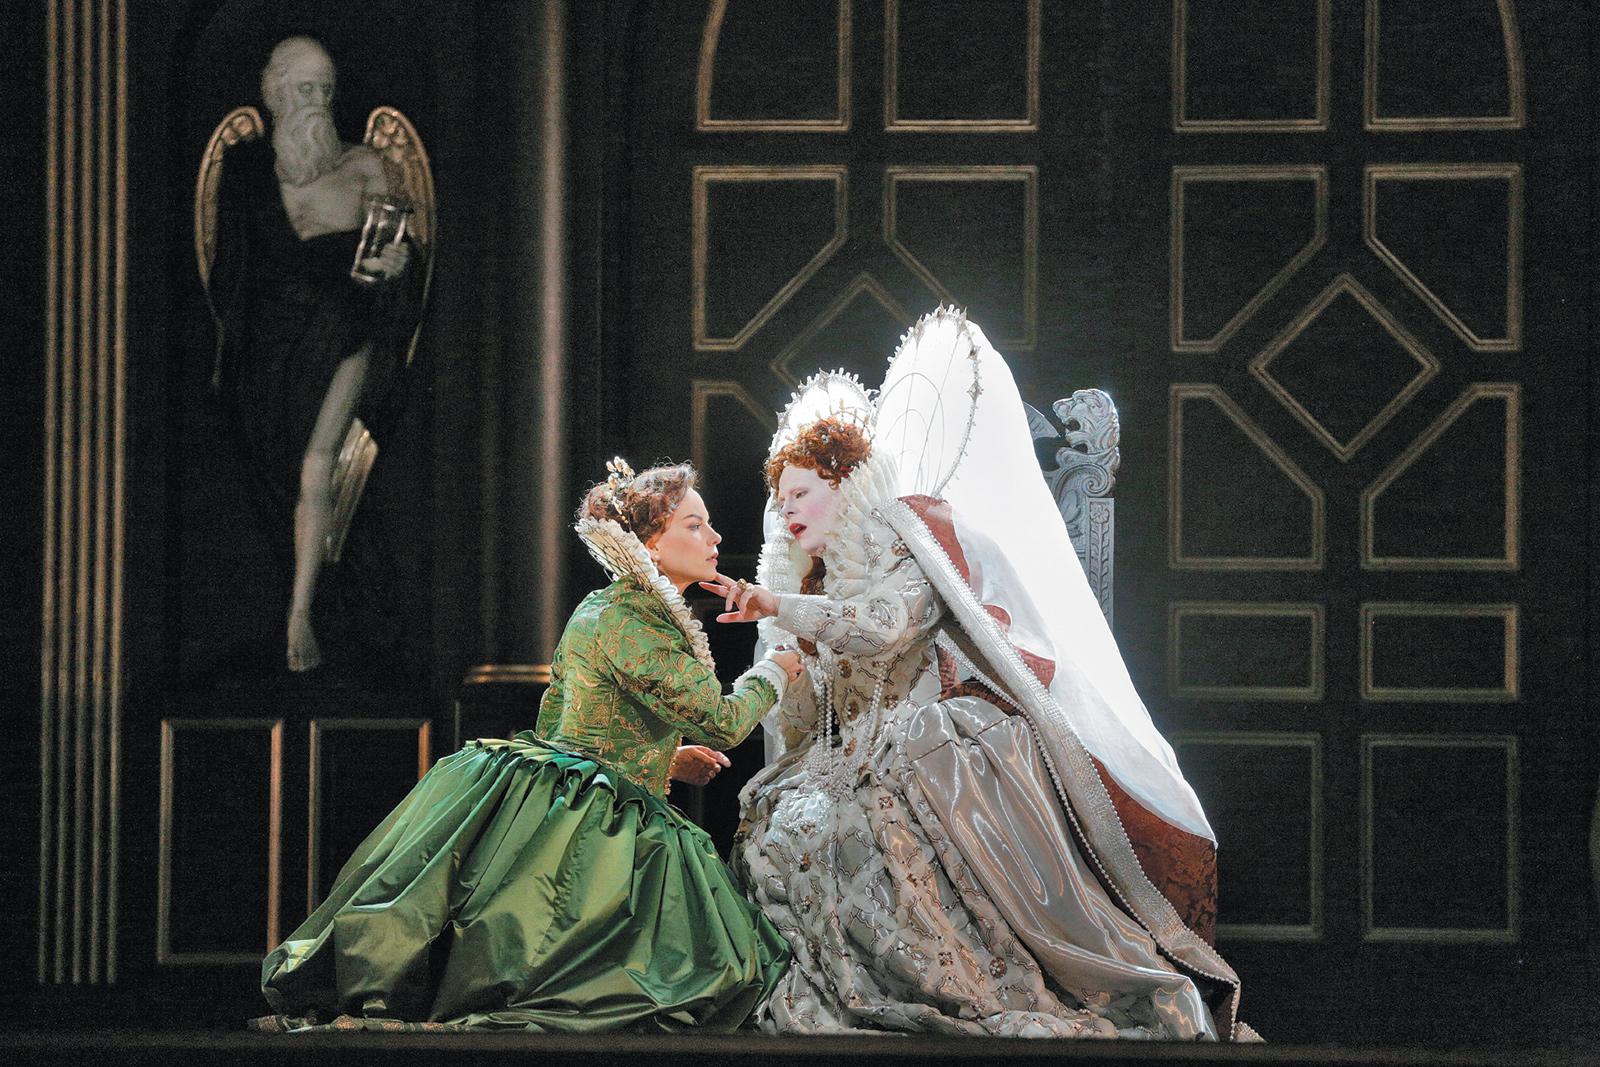 Elīna Garanča as Sara and Sondra Radvanovsky as Elizabeth I in the Metropolitan Opera's recent production of Donizetti's Roberto Devereux